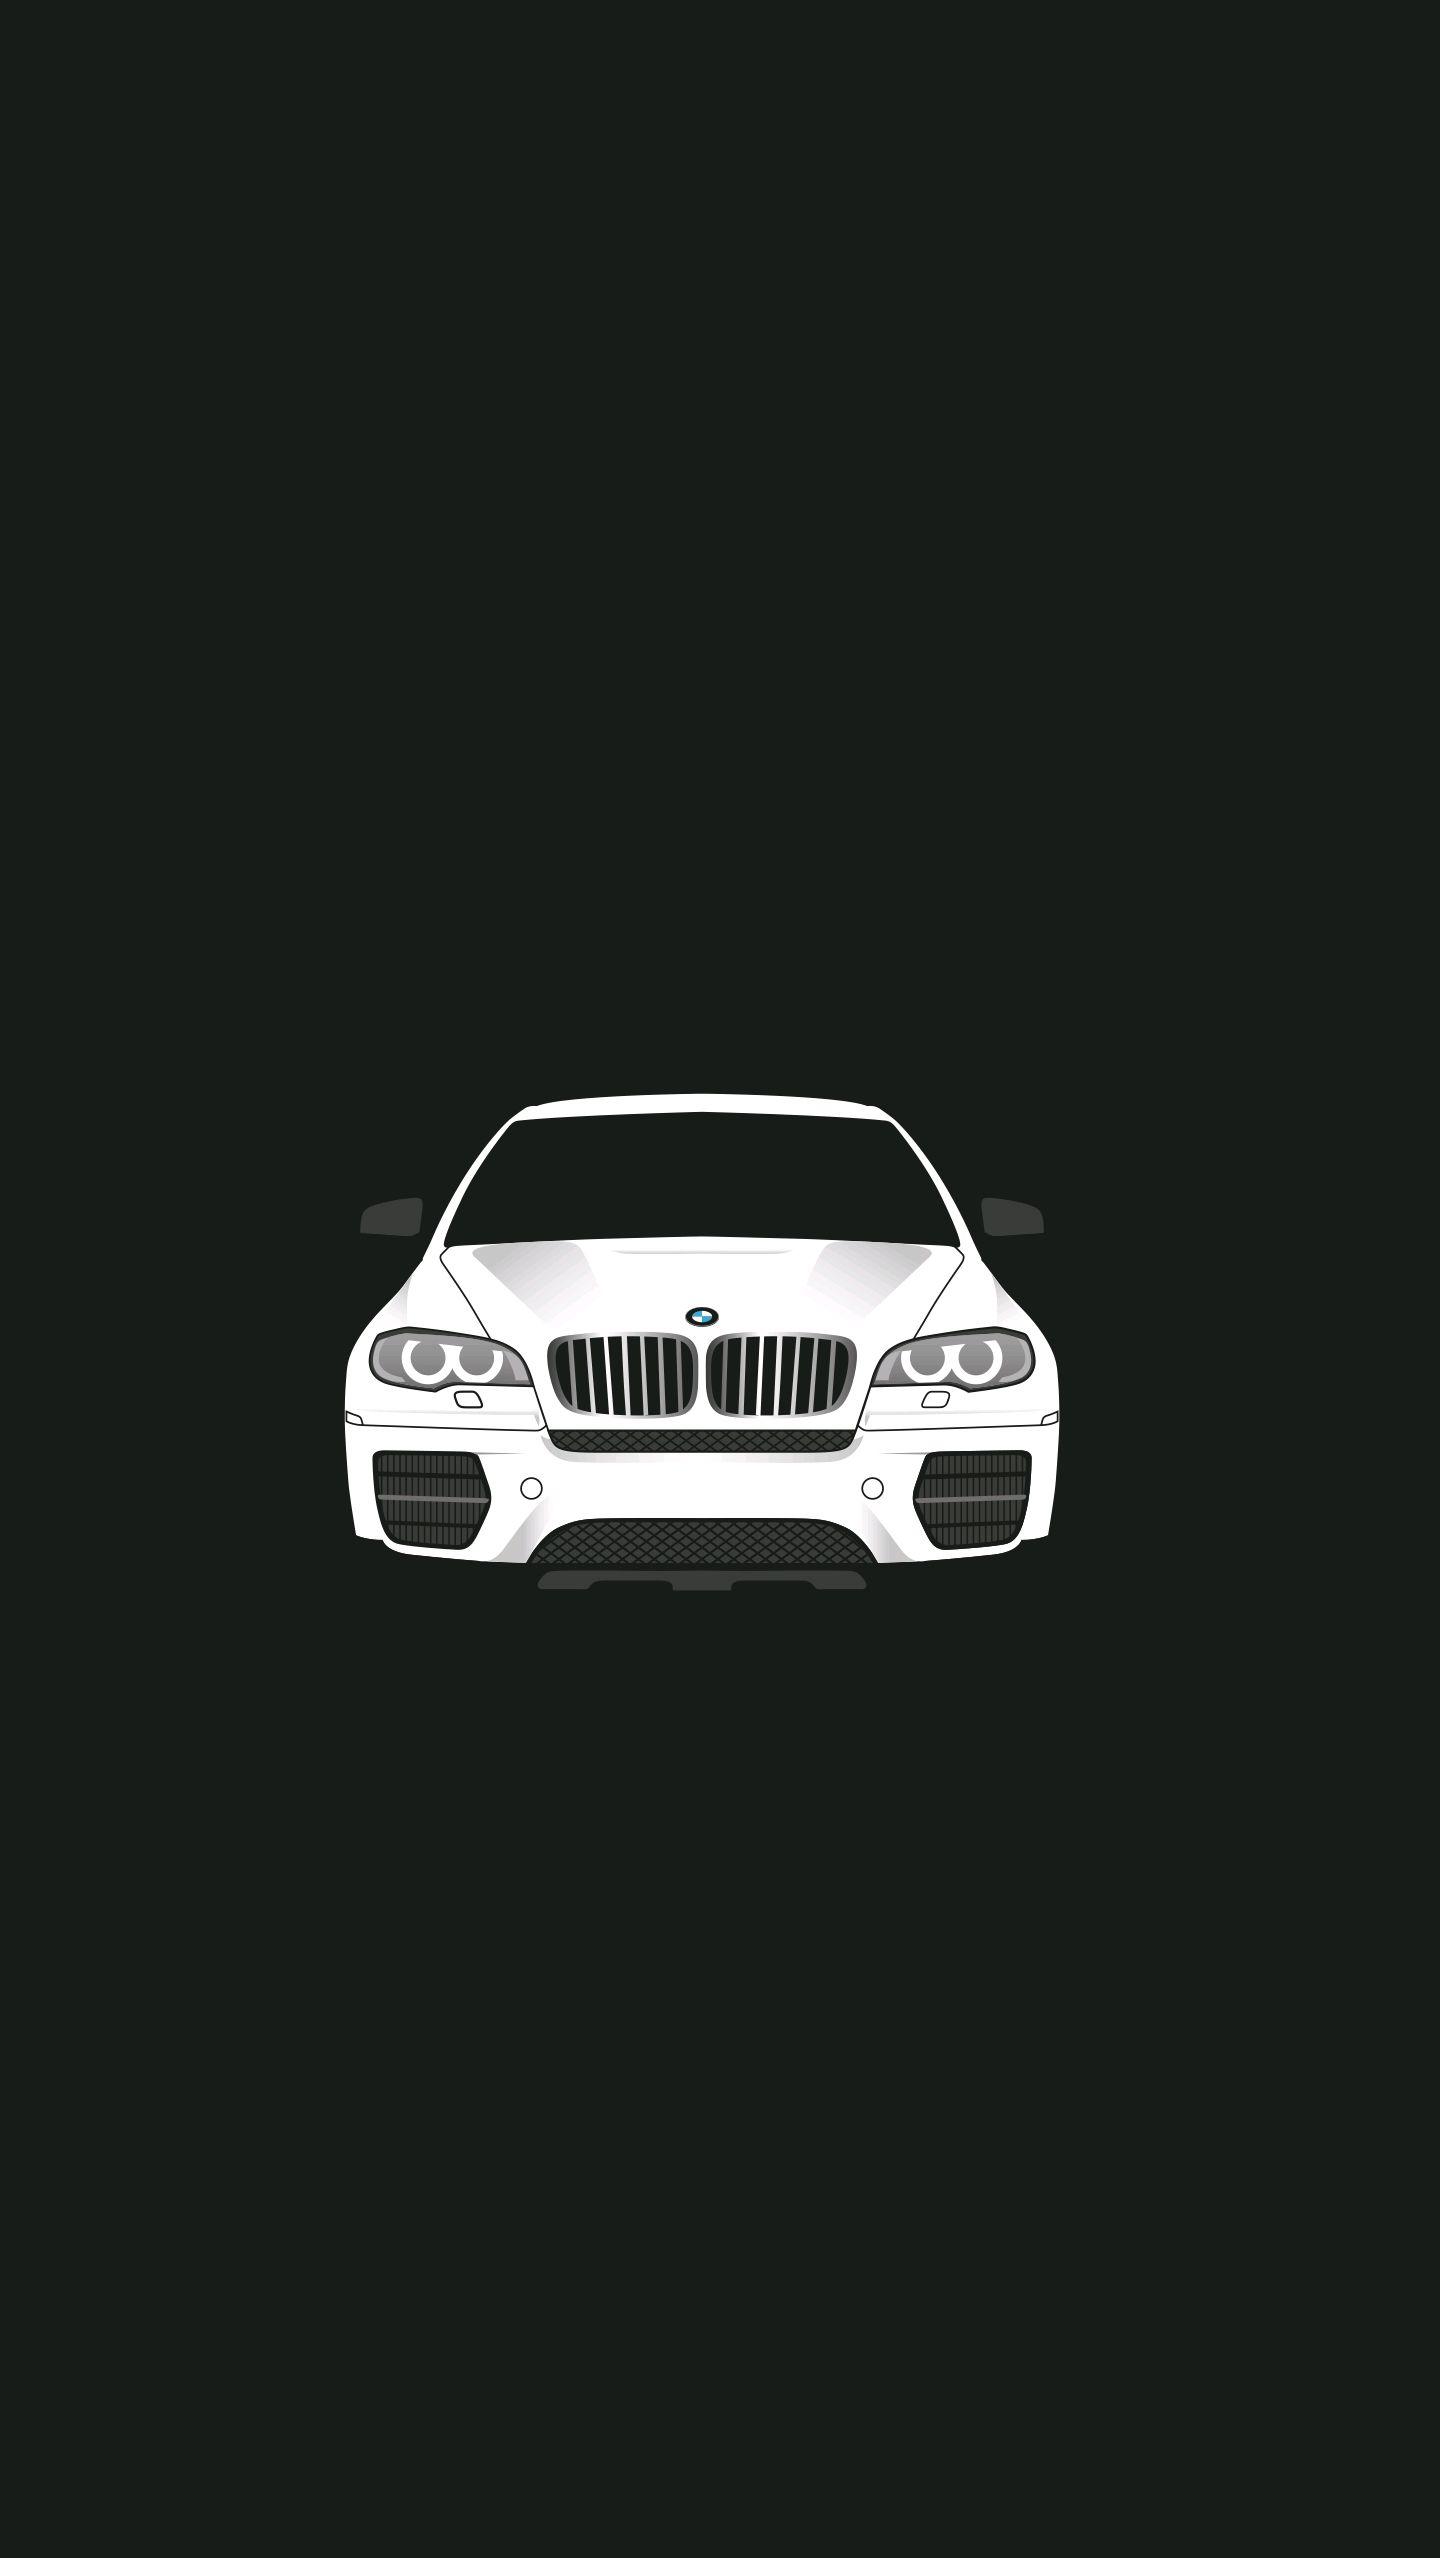 Minimal BMW Car iPhone Wallpaper iphoneswallpapers com